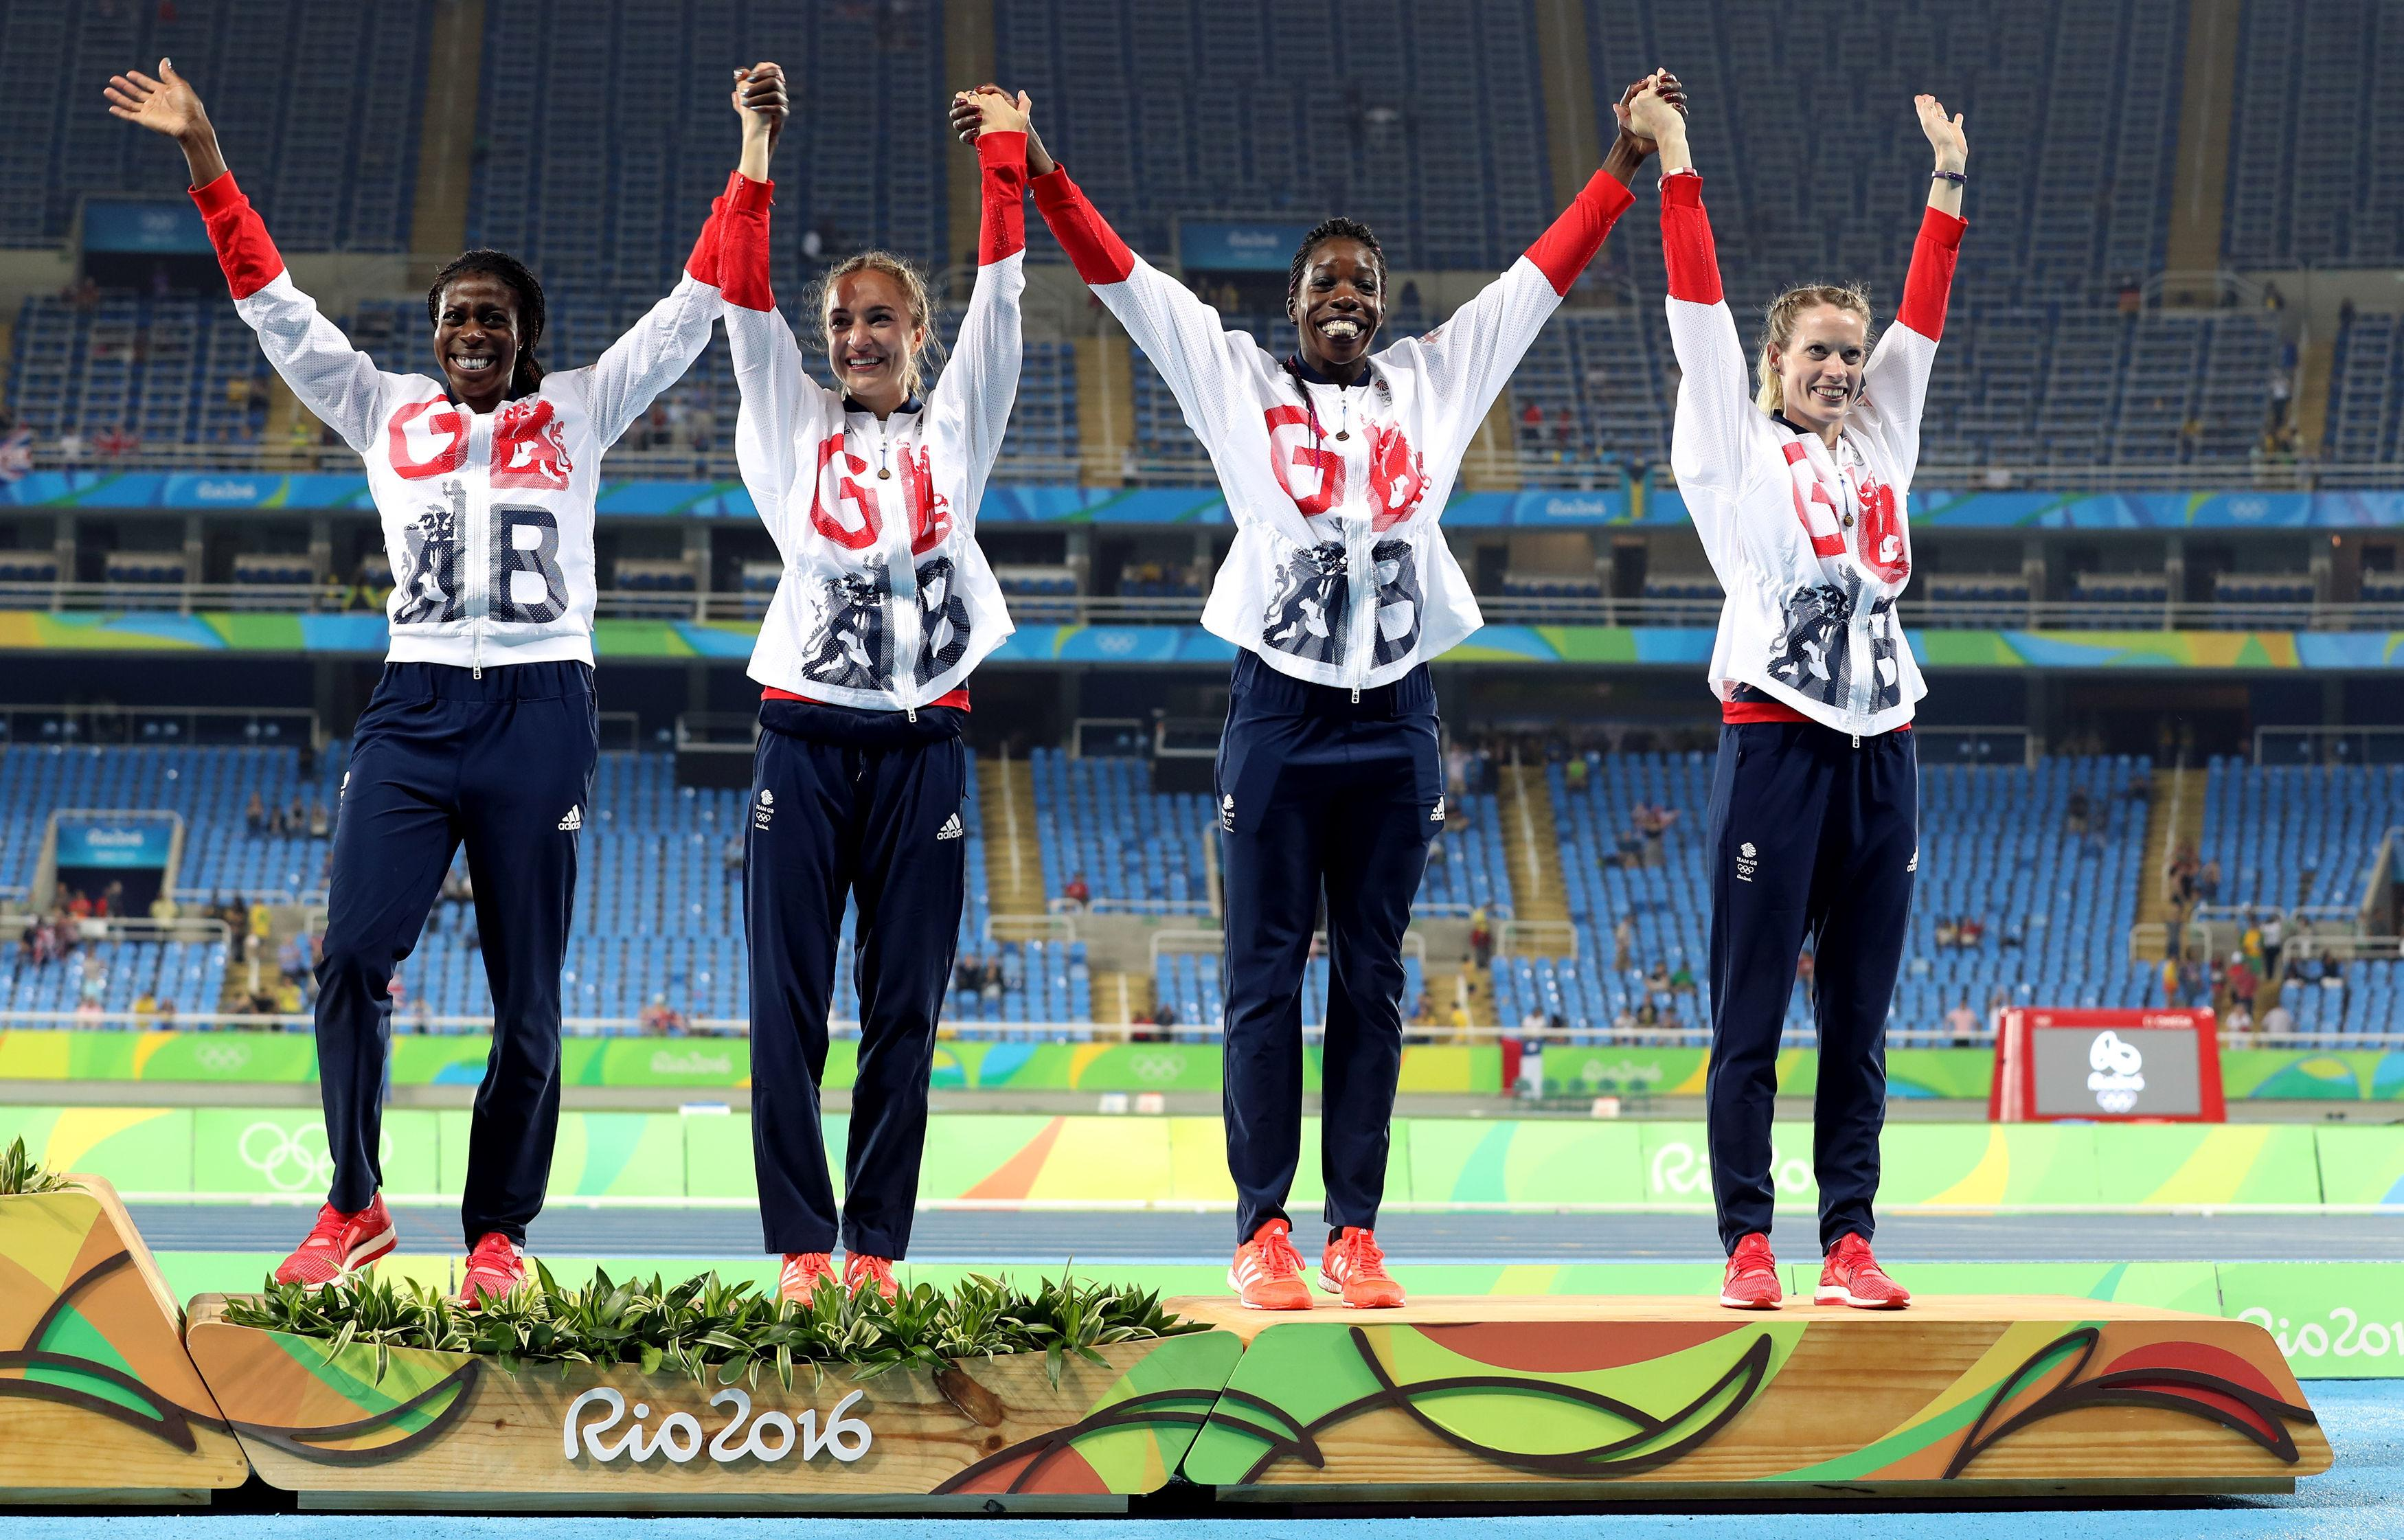 Ohuruogu with her bronze medal-winning 4x400m relay team in Rio